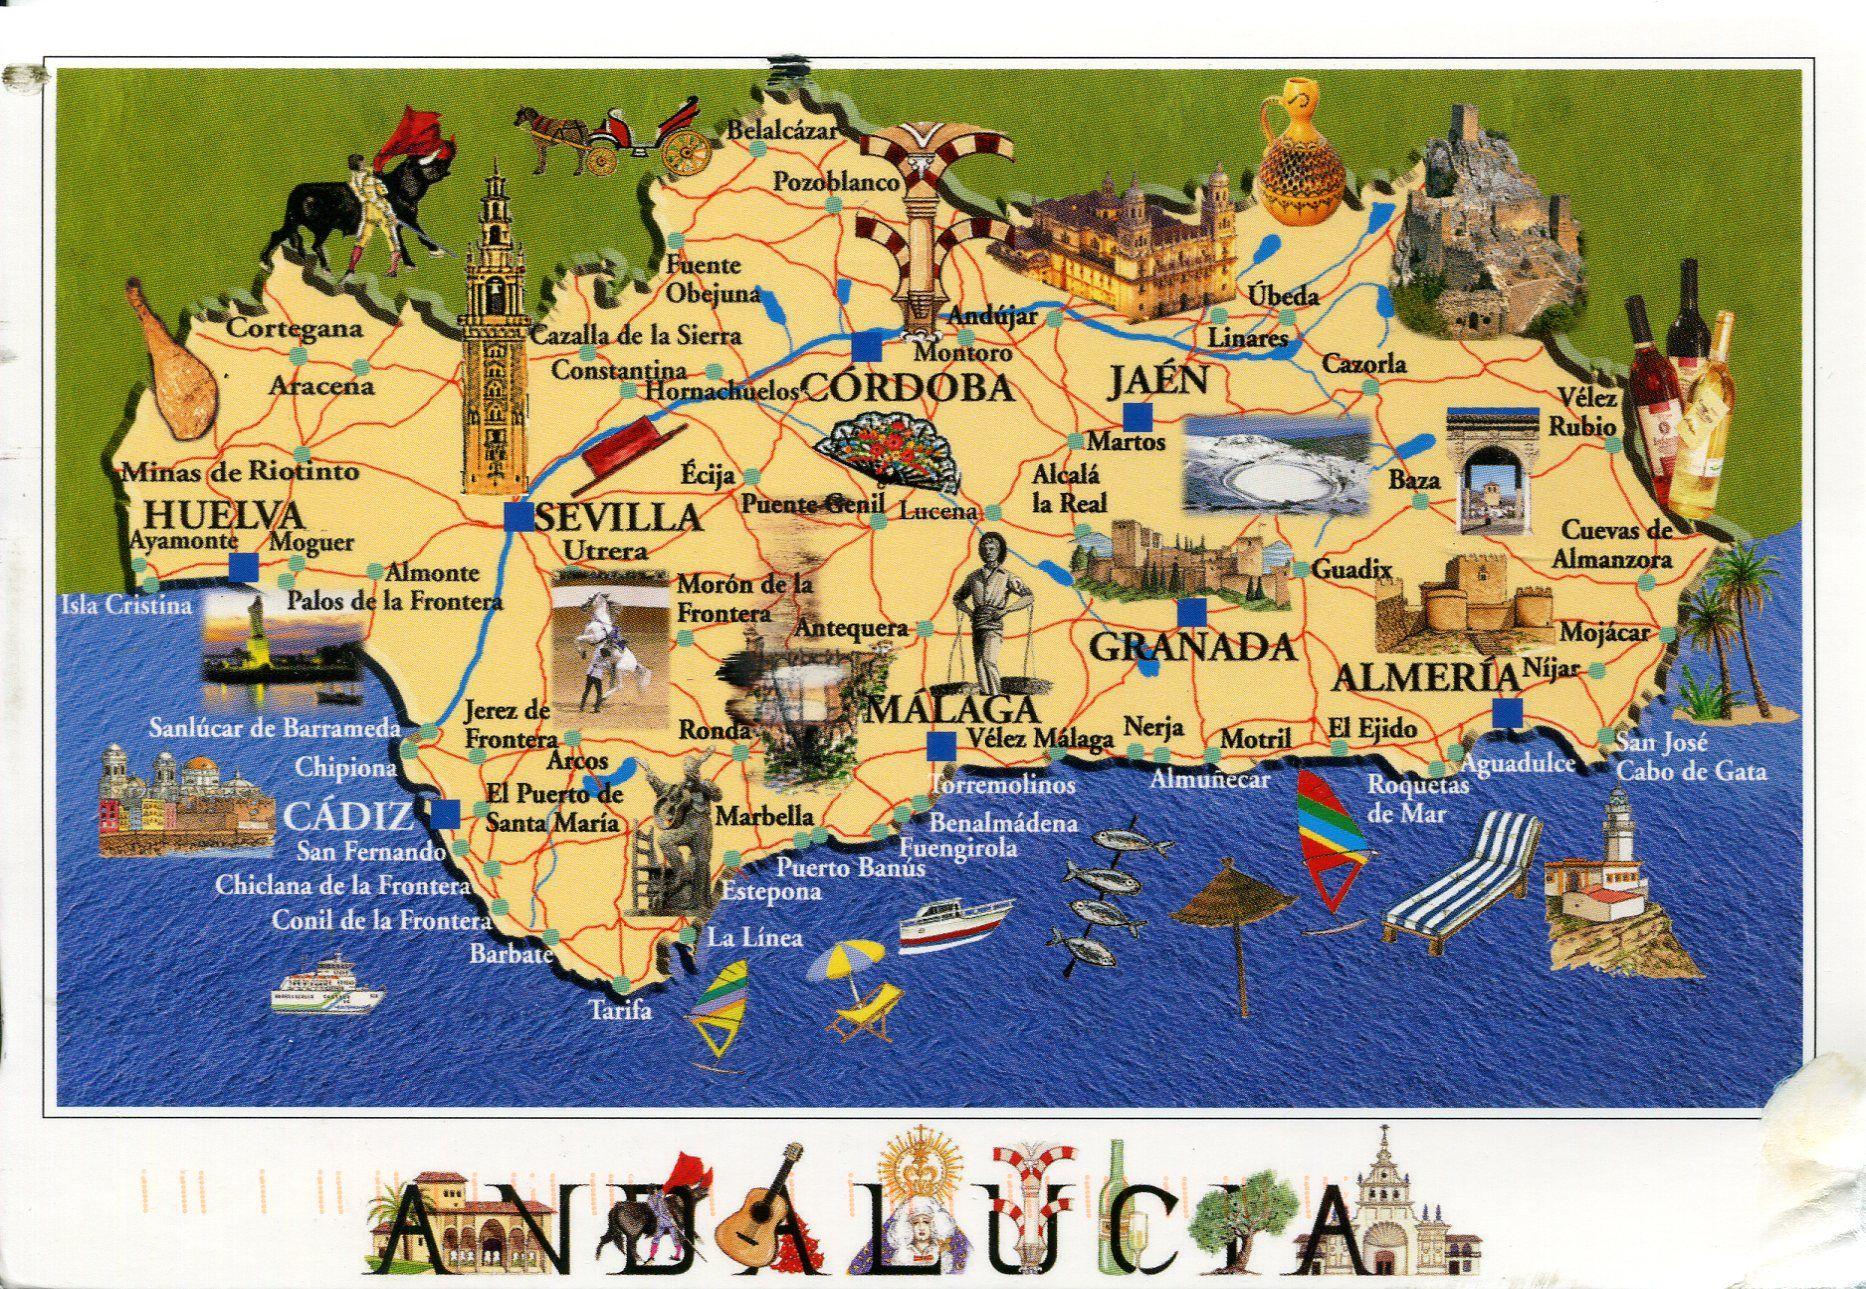 Carte Littoral Andalousie.Carte Touristique Voyage Espagne Andalousie Voyage